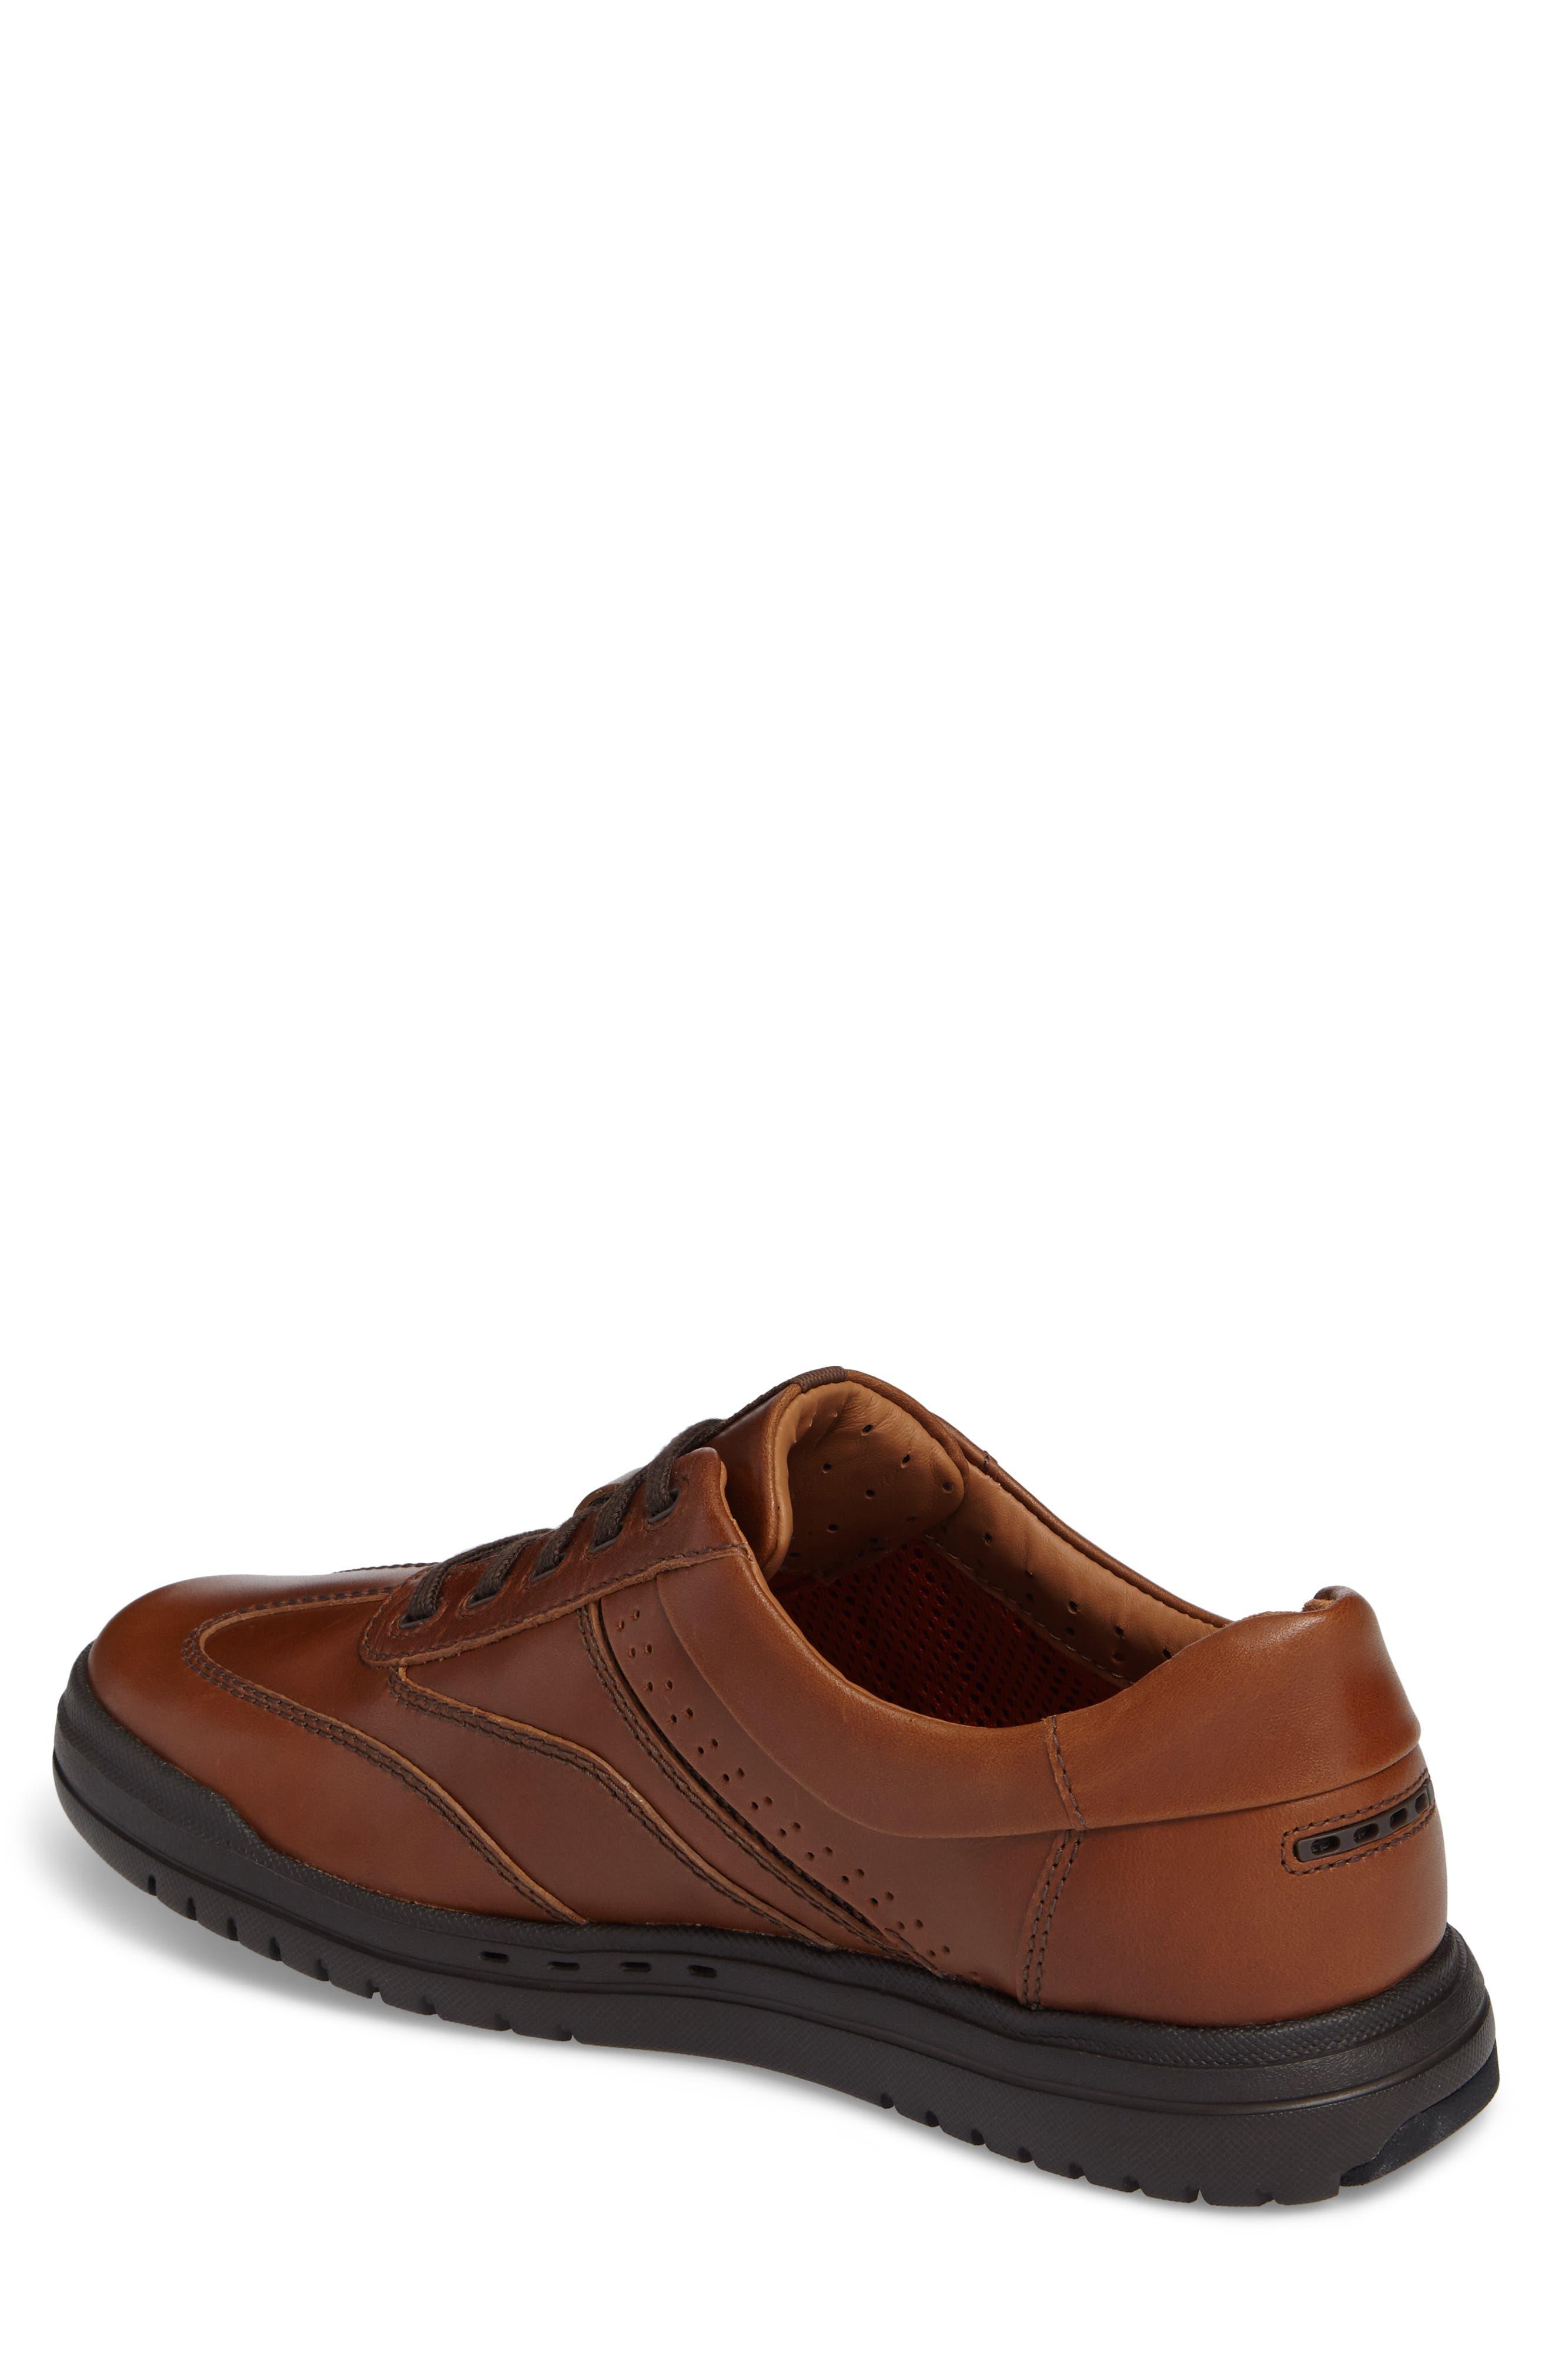 Un.Rhombus Fly Sneaker,                             Alternate thumbnail 2, color,                             238